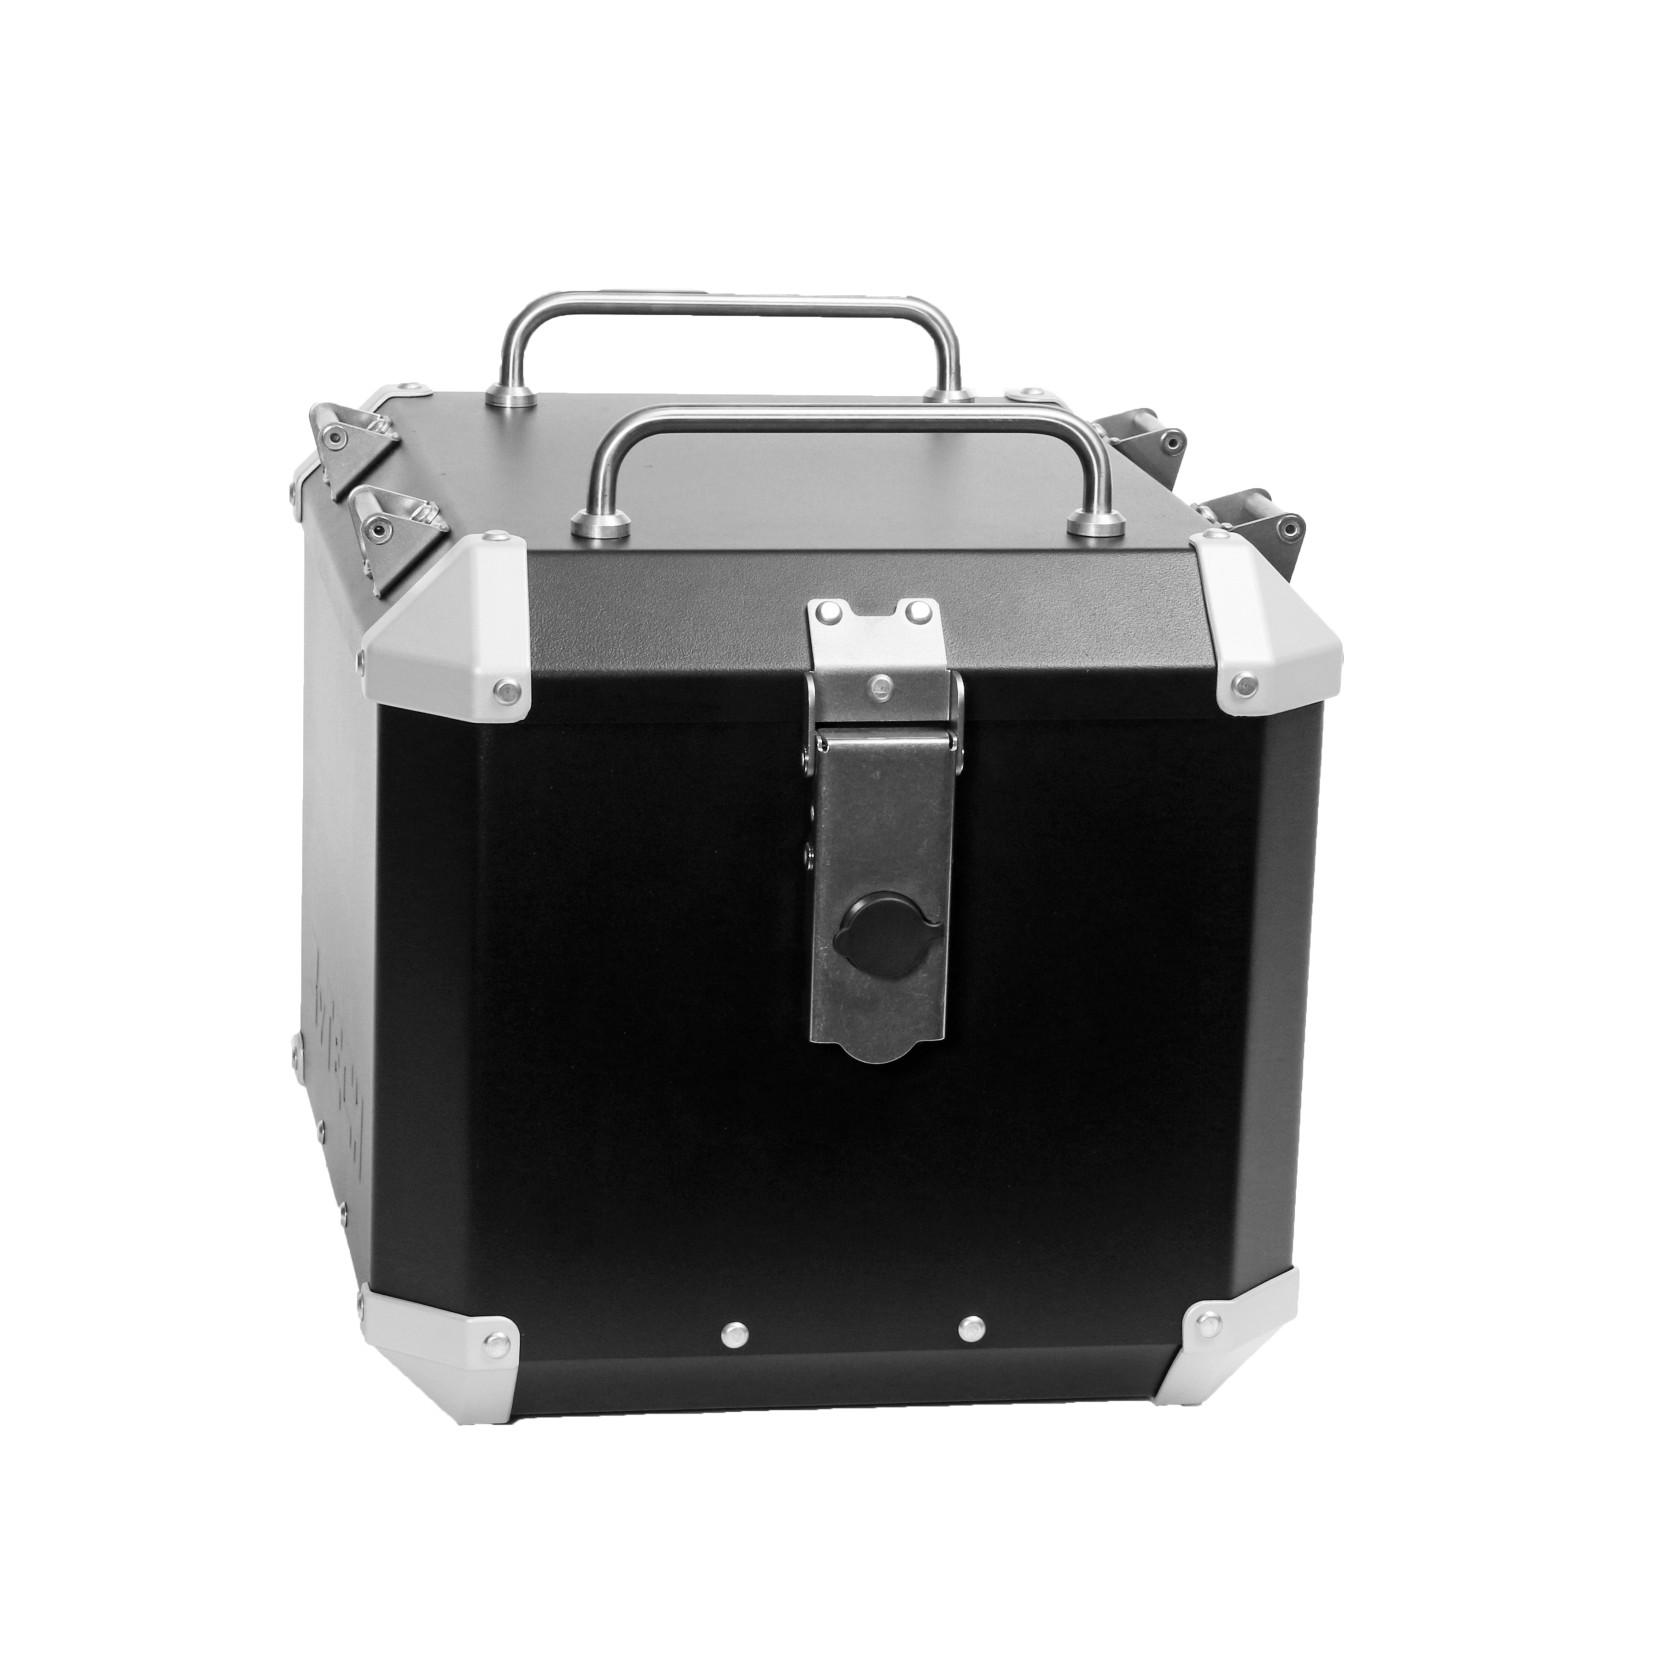 MyTech TOP CASE 33 ltr with Rack - Black ---SAVE